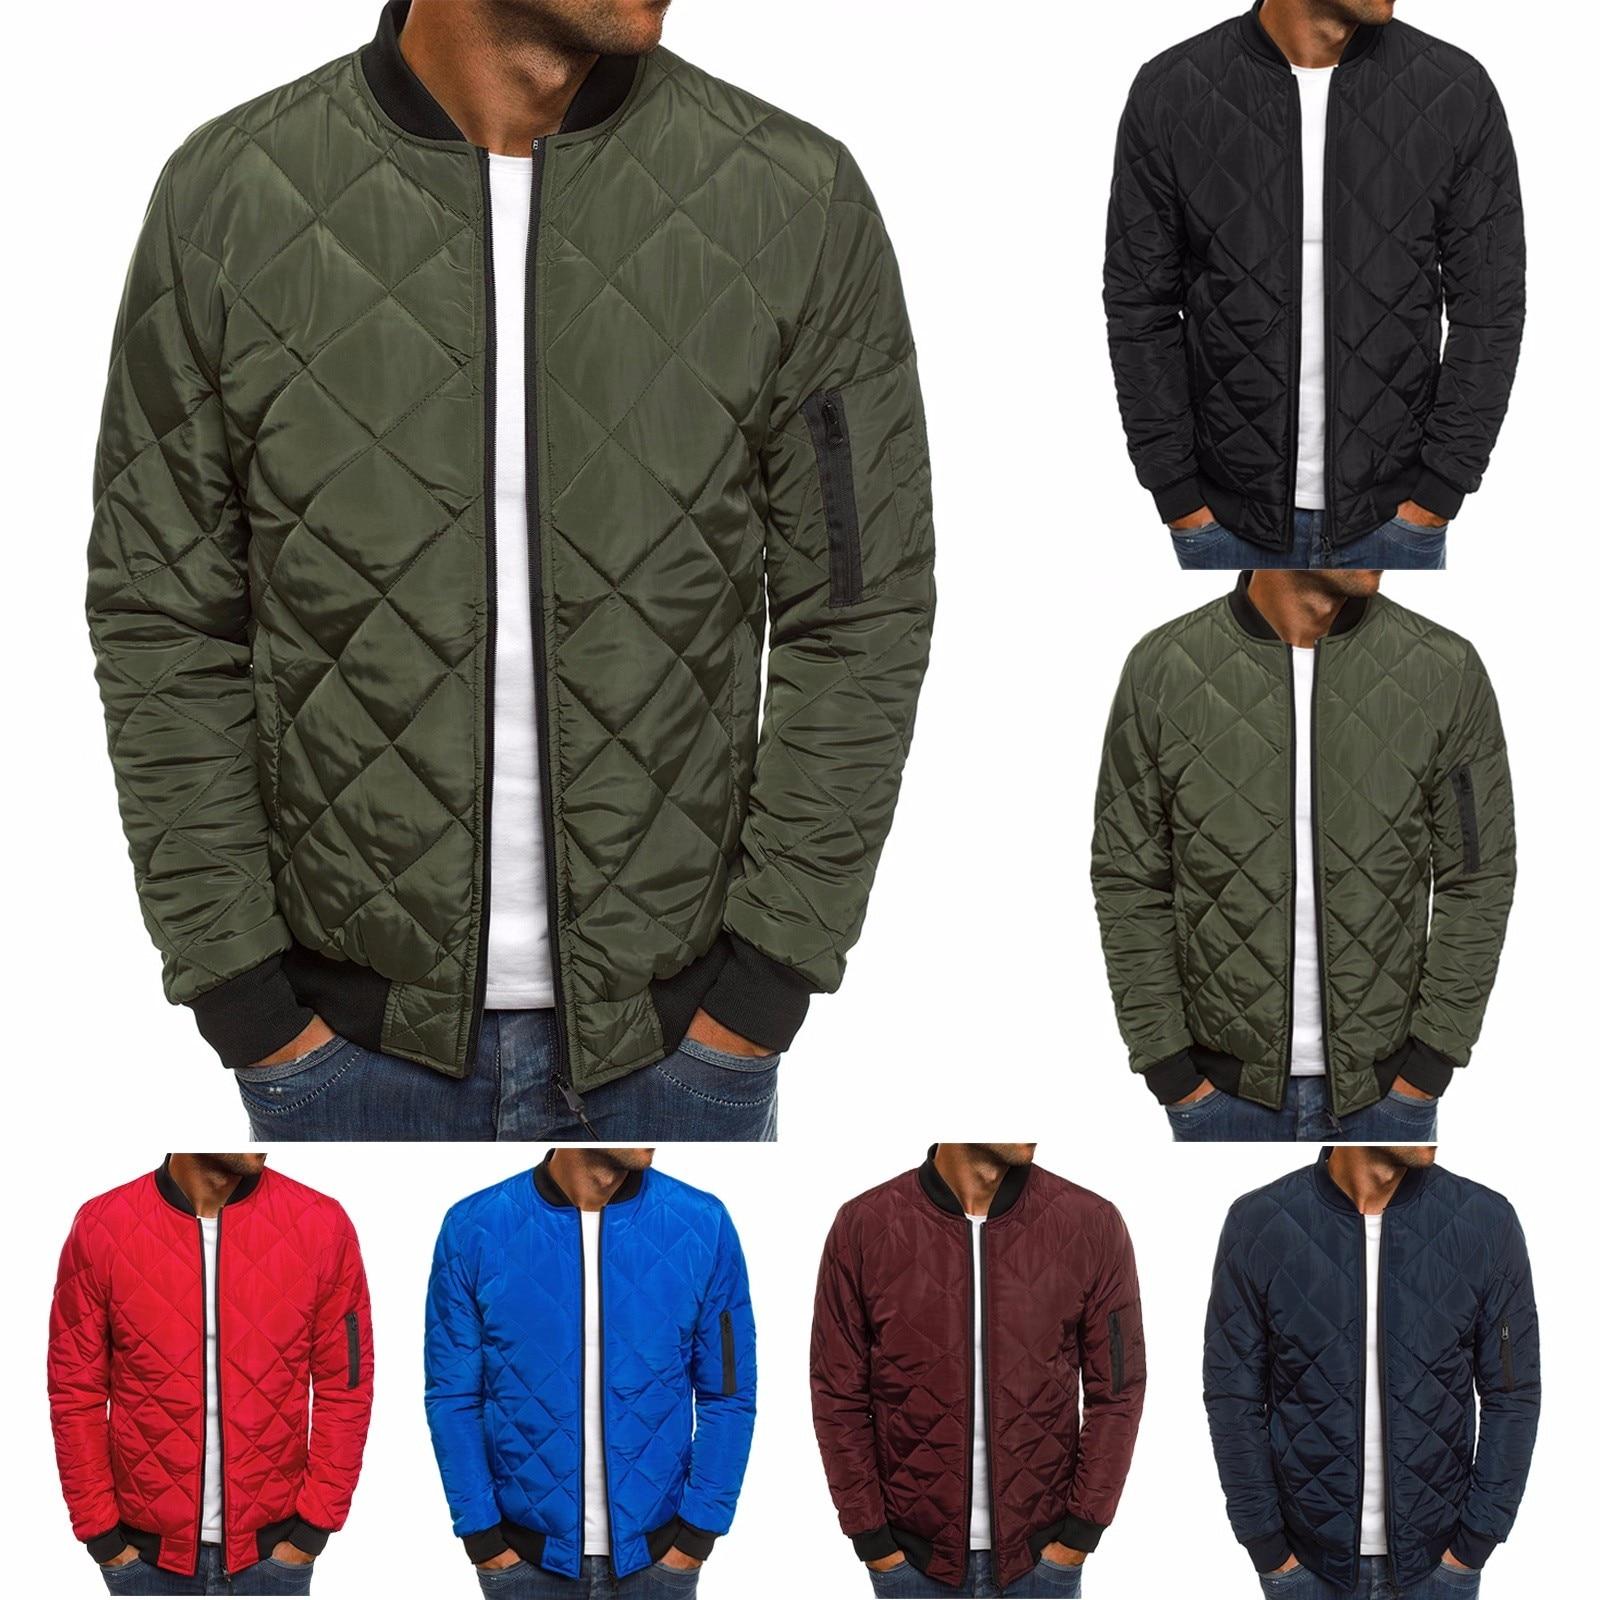 ZOGAA Men Autumn Casual Plaid   Parkas   Jacket Wind Breaker Solid Color Brand Overcoat Winter Clothes Zipper Jackets